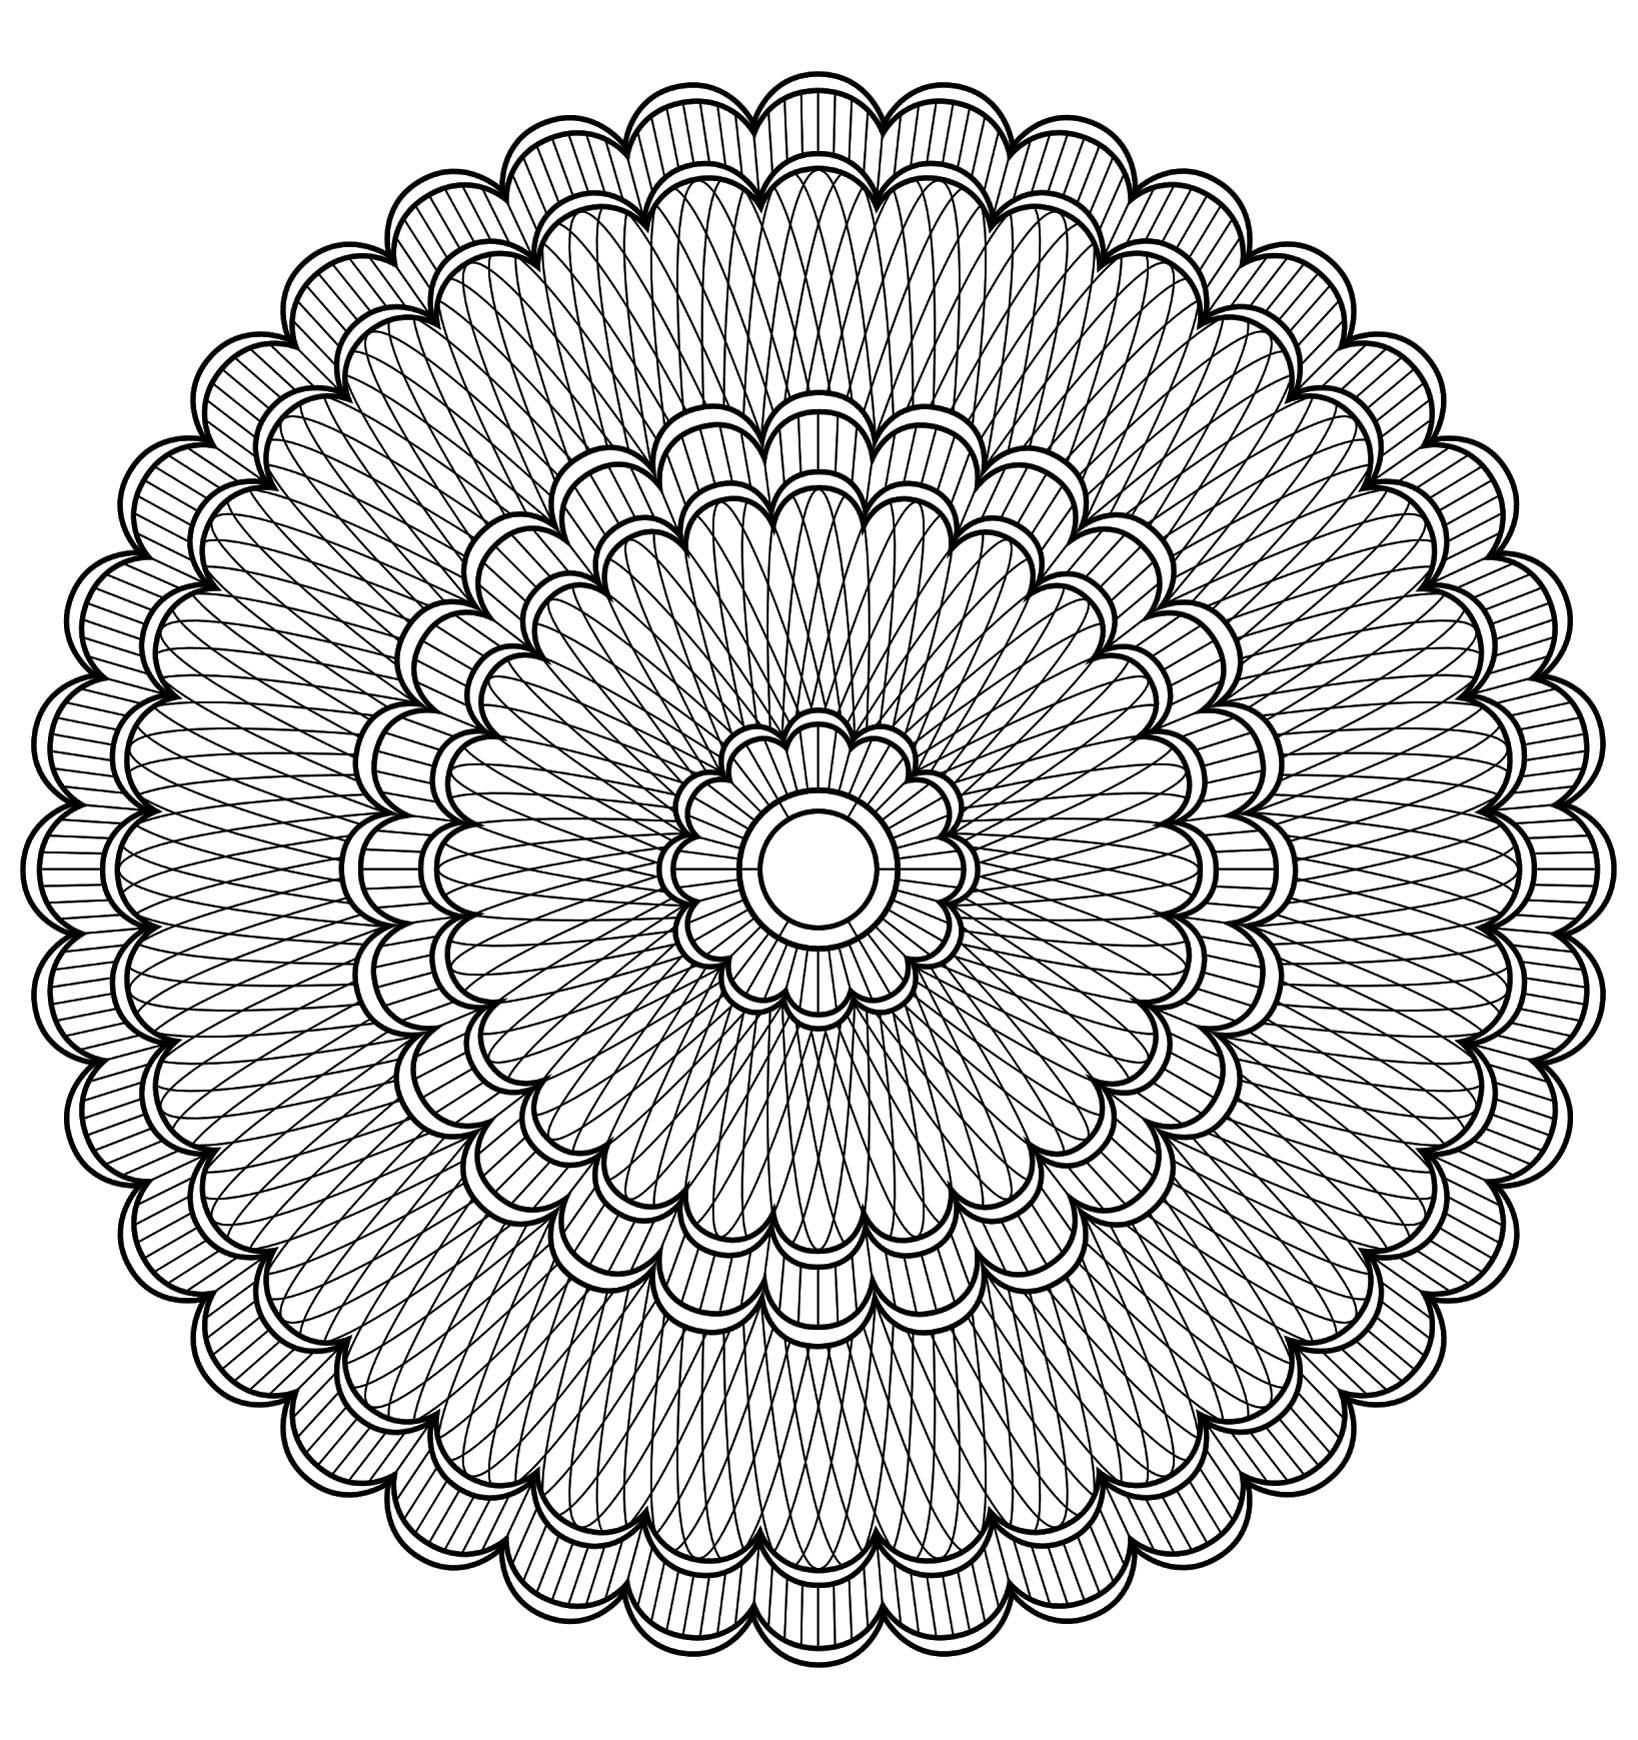 Tr¨s joli mandala  colorier o¹ figure plusieurs fleurs tr¨s jolies Niveau normal